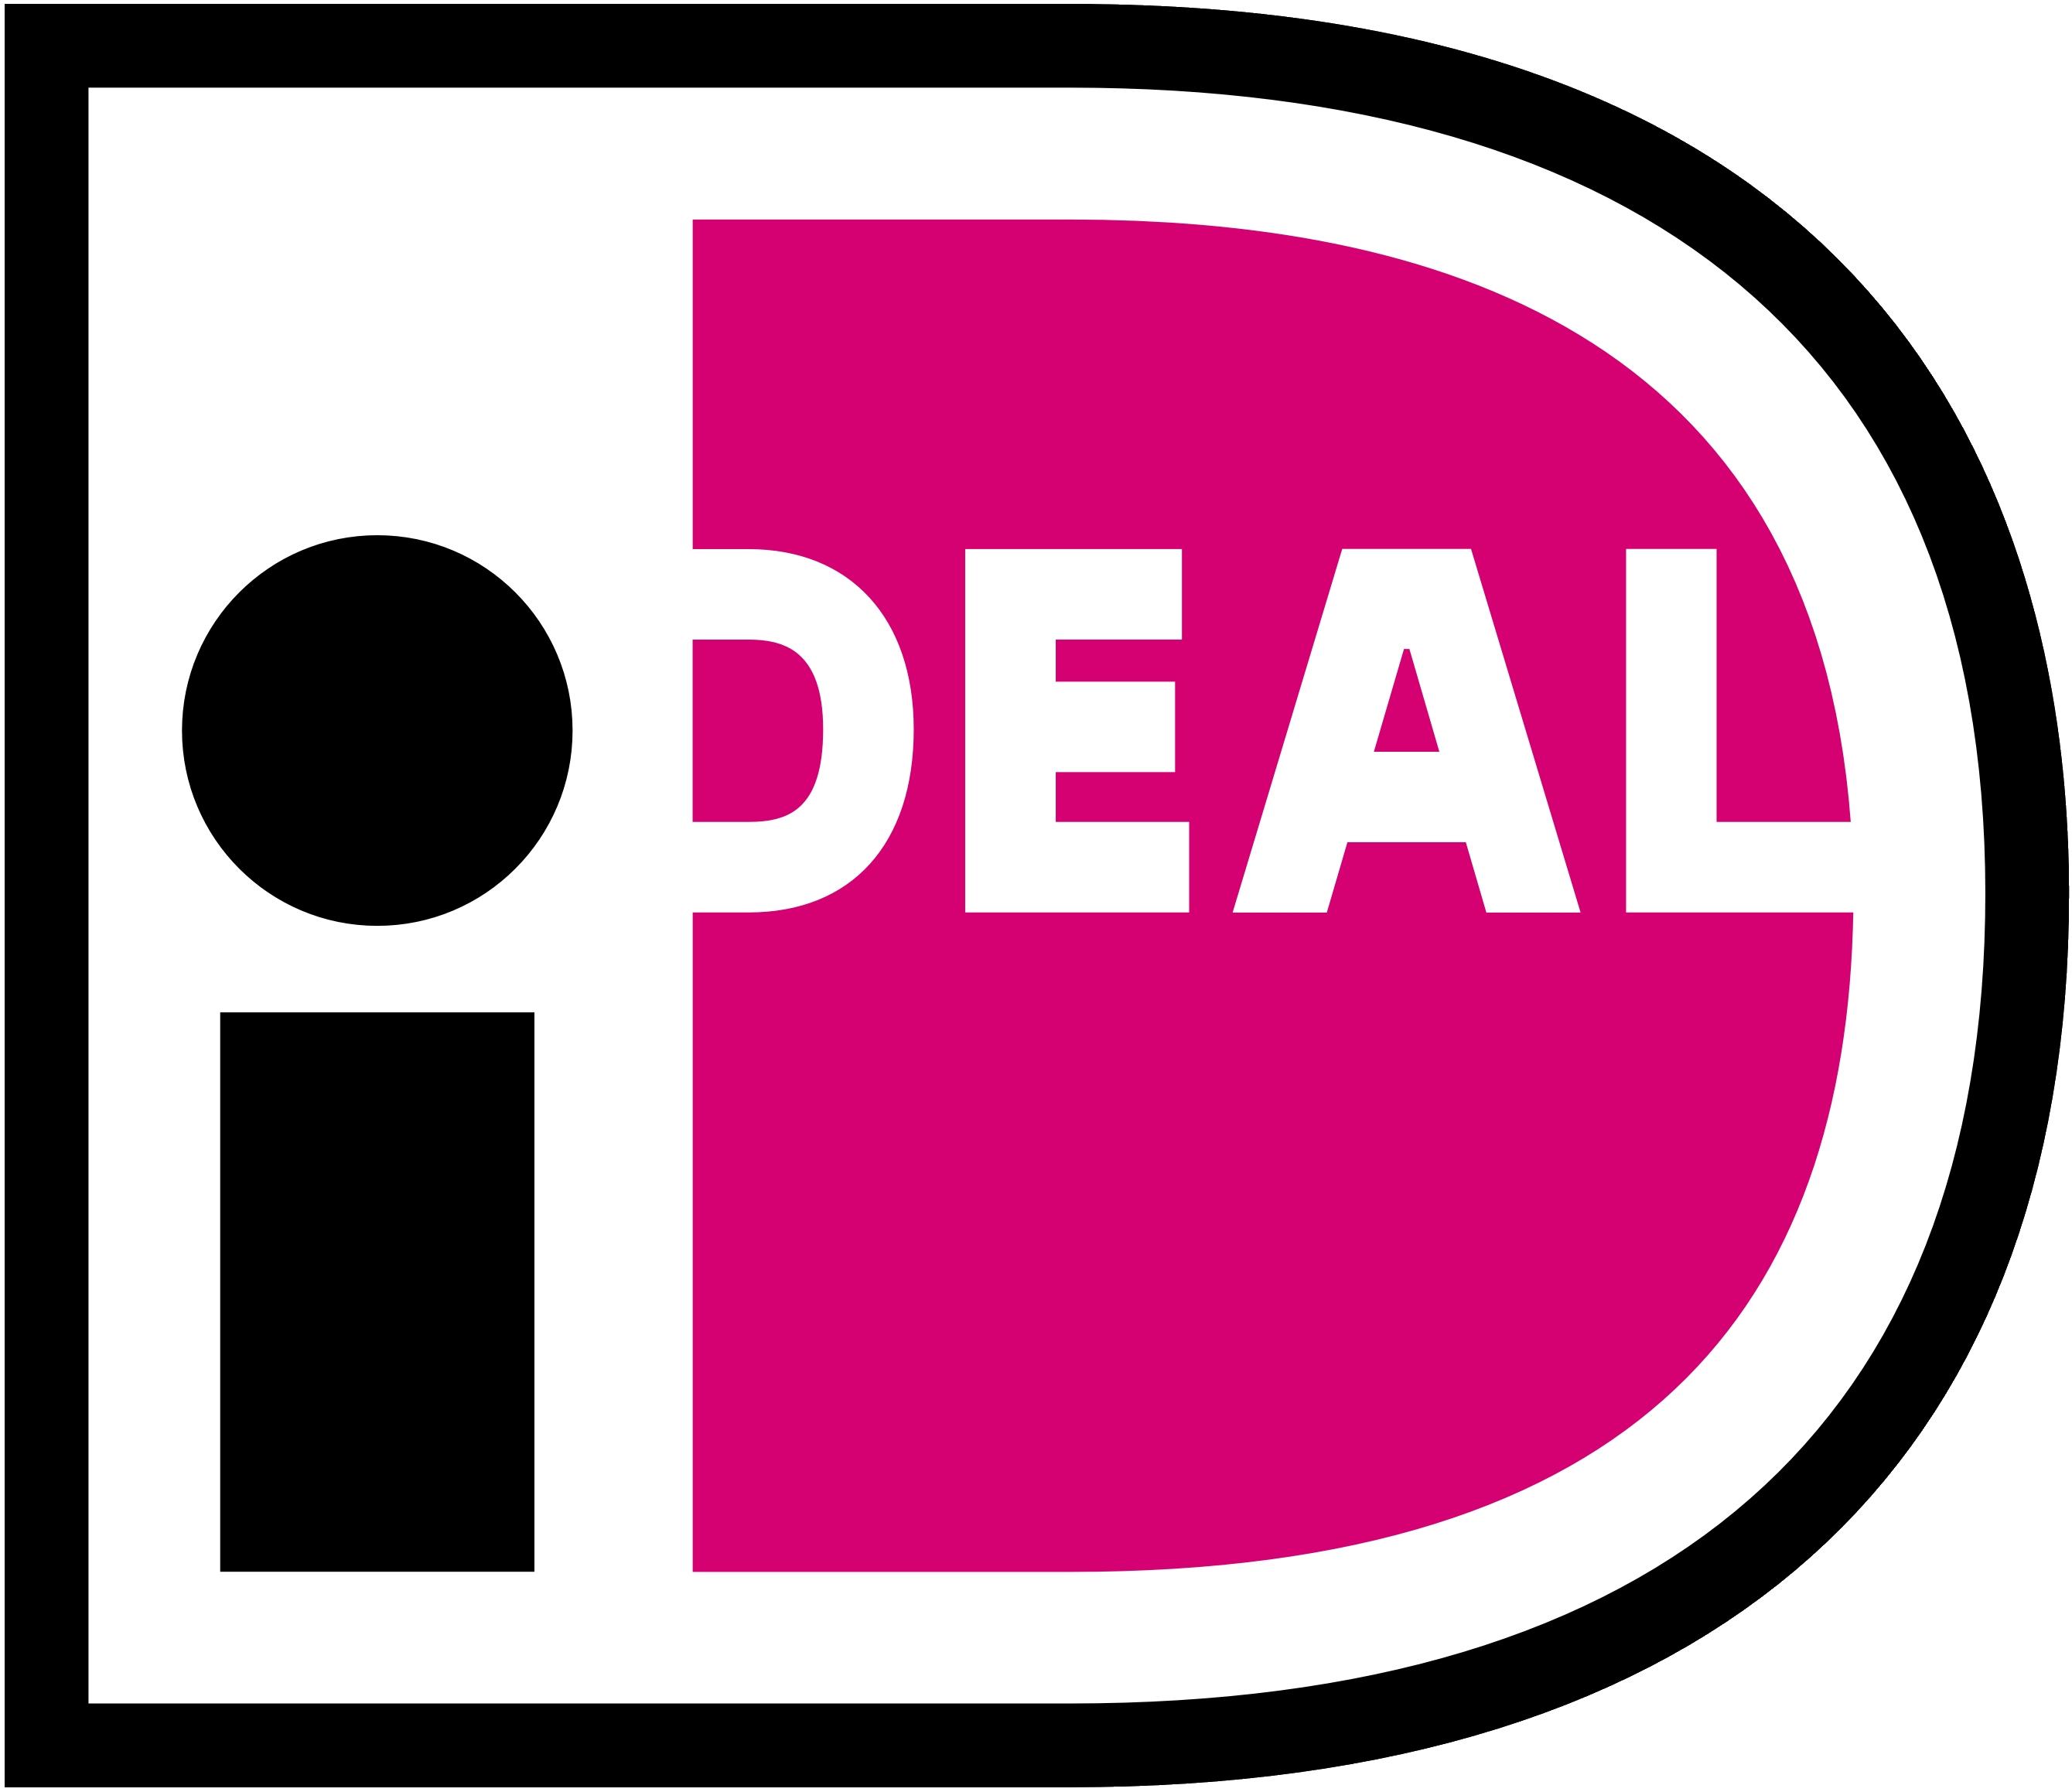 Ideal Logo